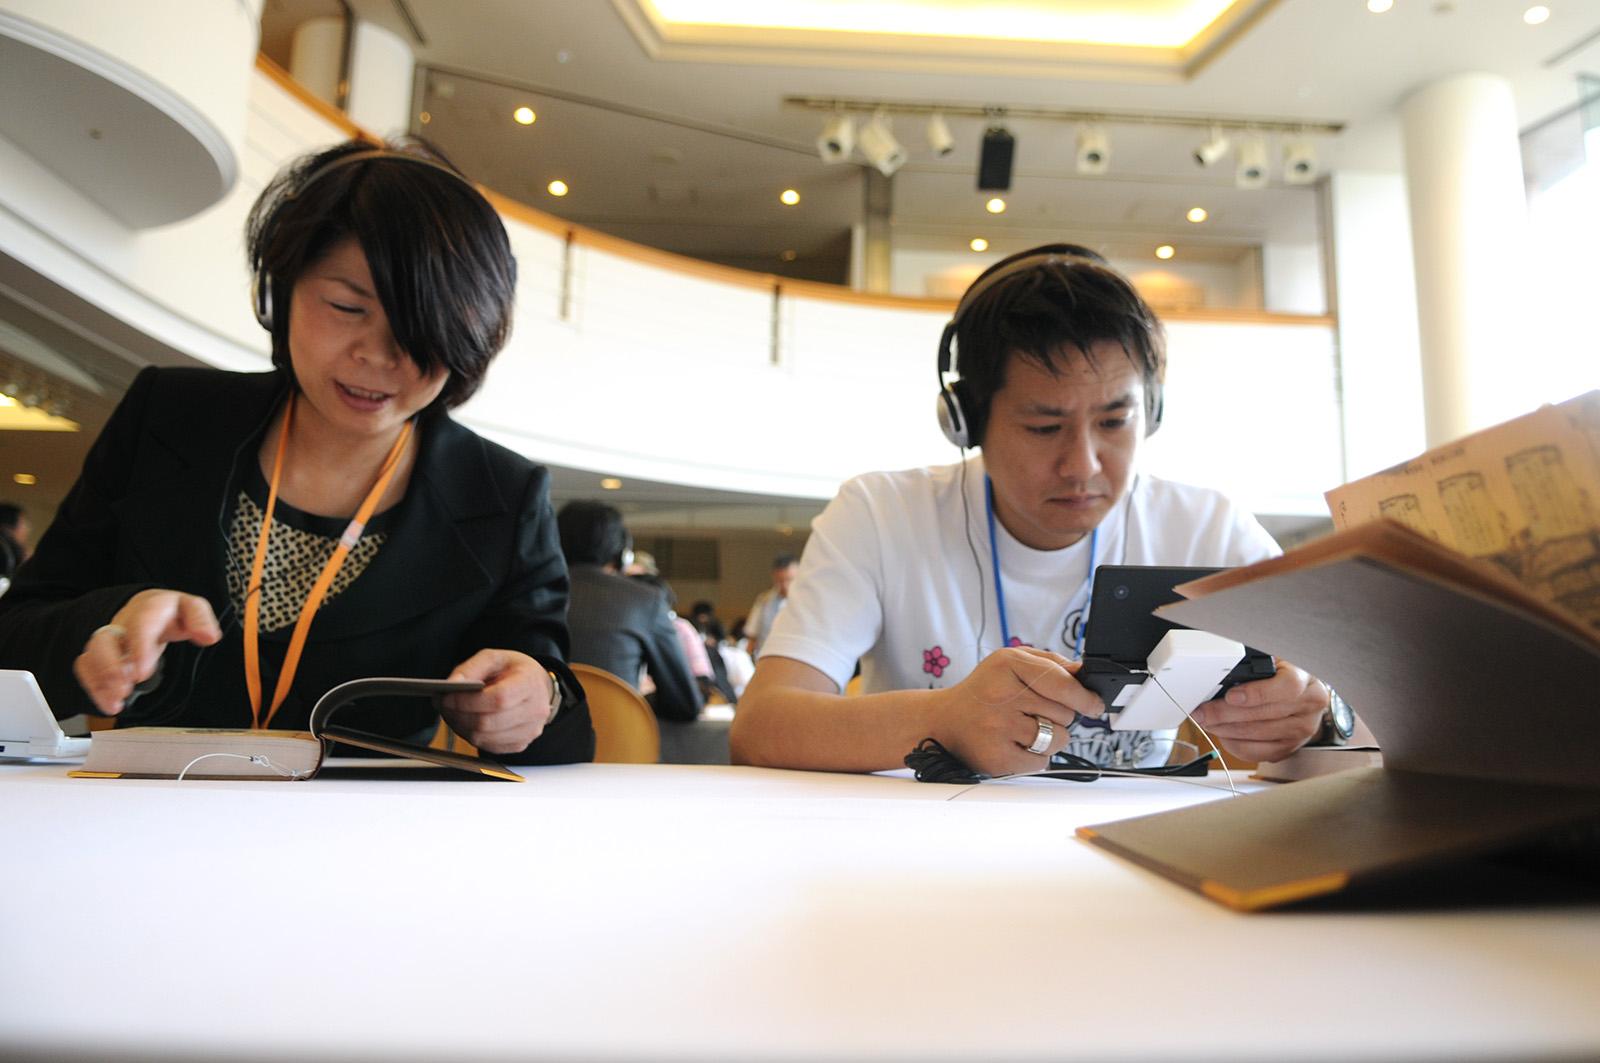 Hisako Akitani, left, and Daisuke Uchiyama play the yet-to-be-released video game Ninokuni on the handheld video console Nintendo DS